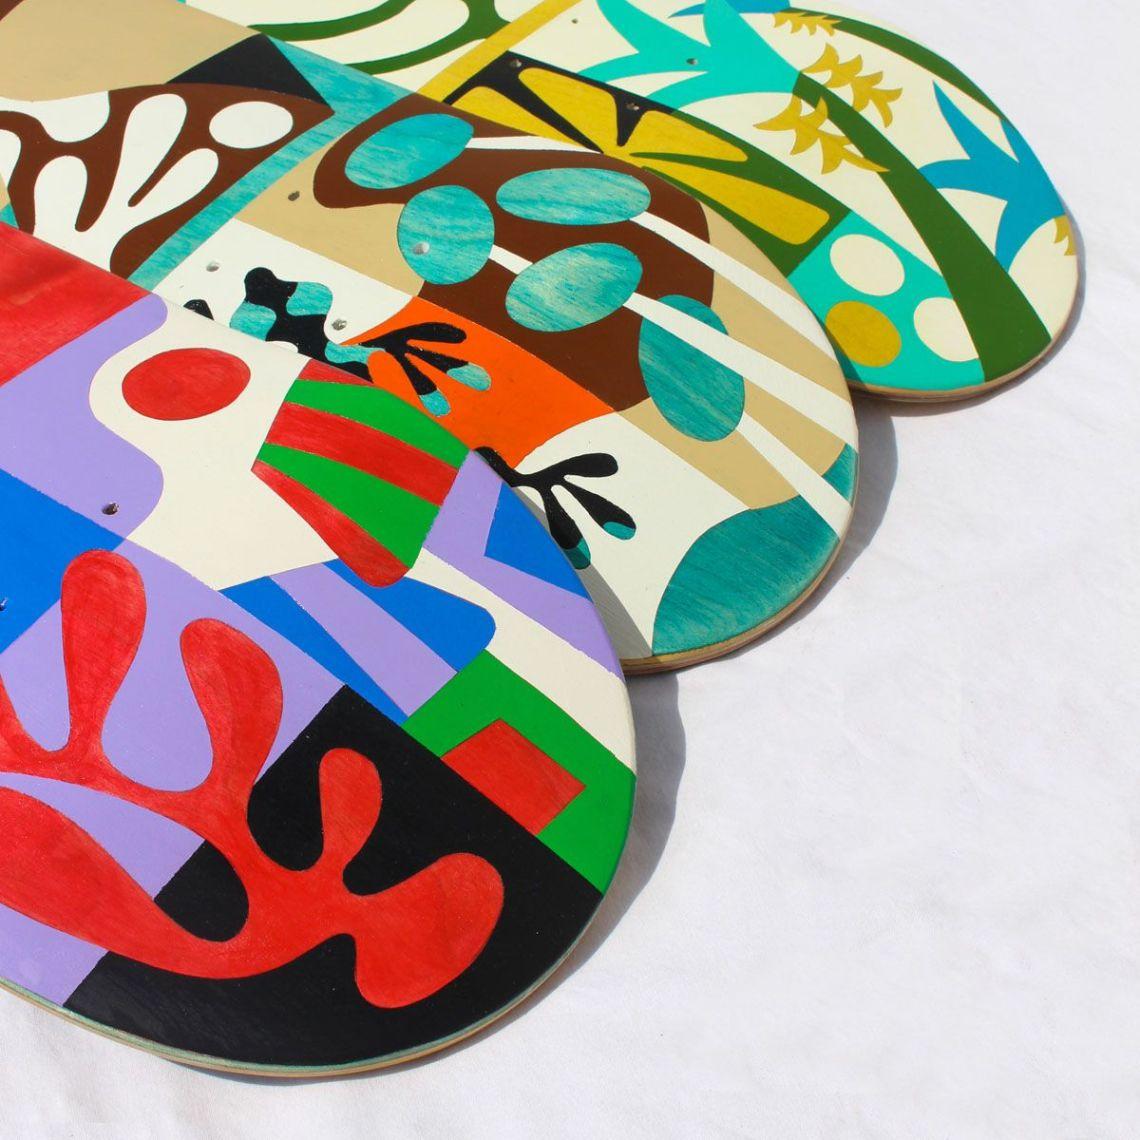 Custom Skateboards By Bart Lanzini For The European Custom Board Show 5